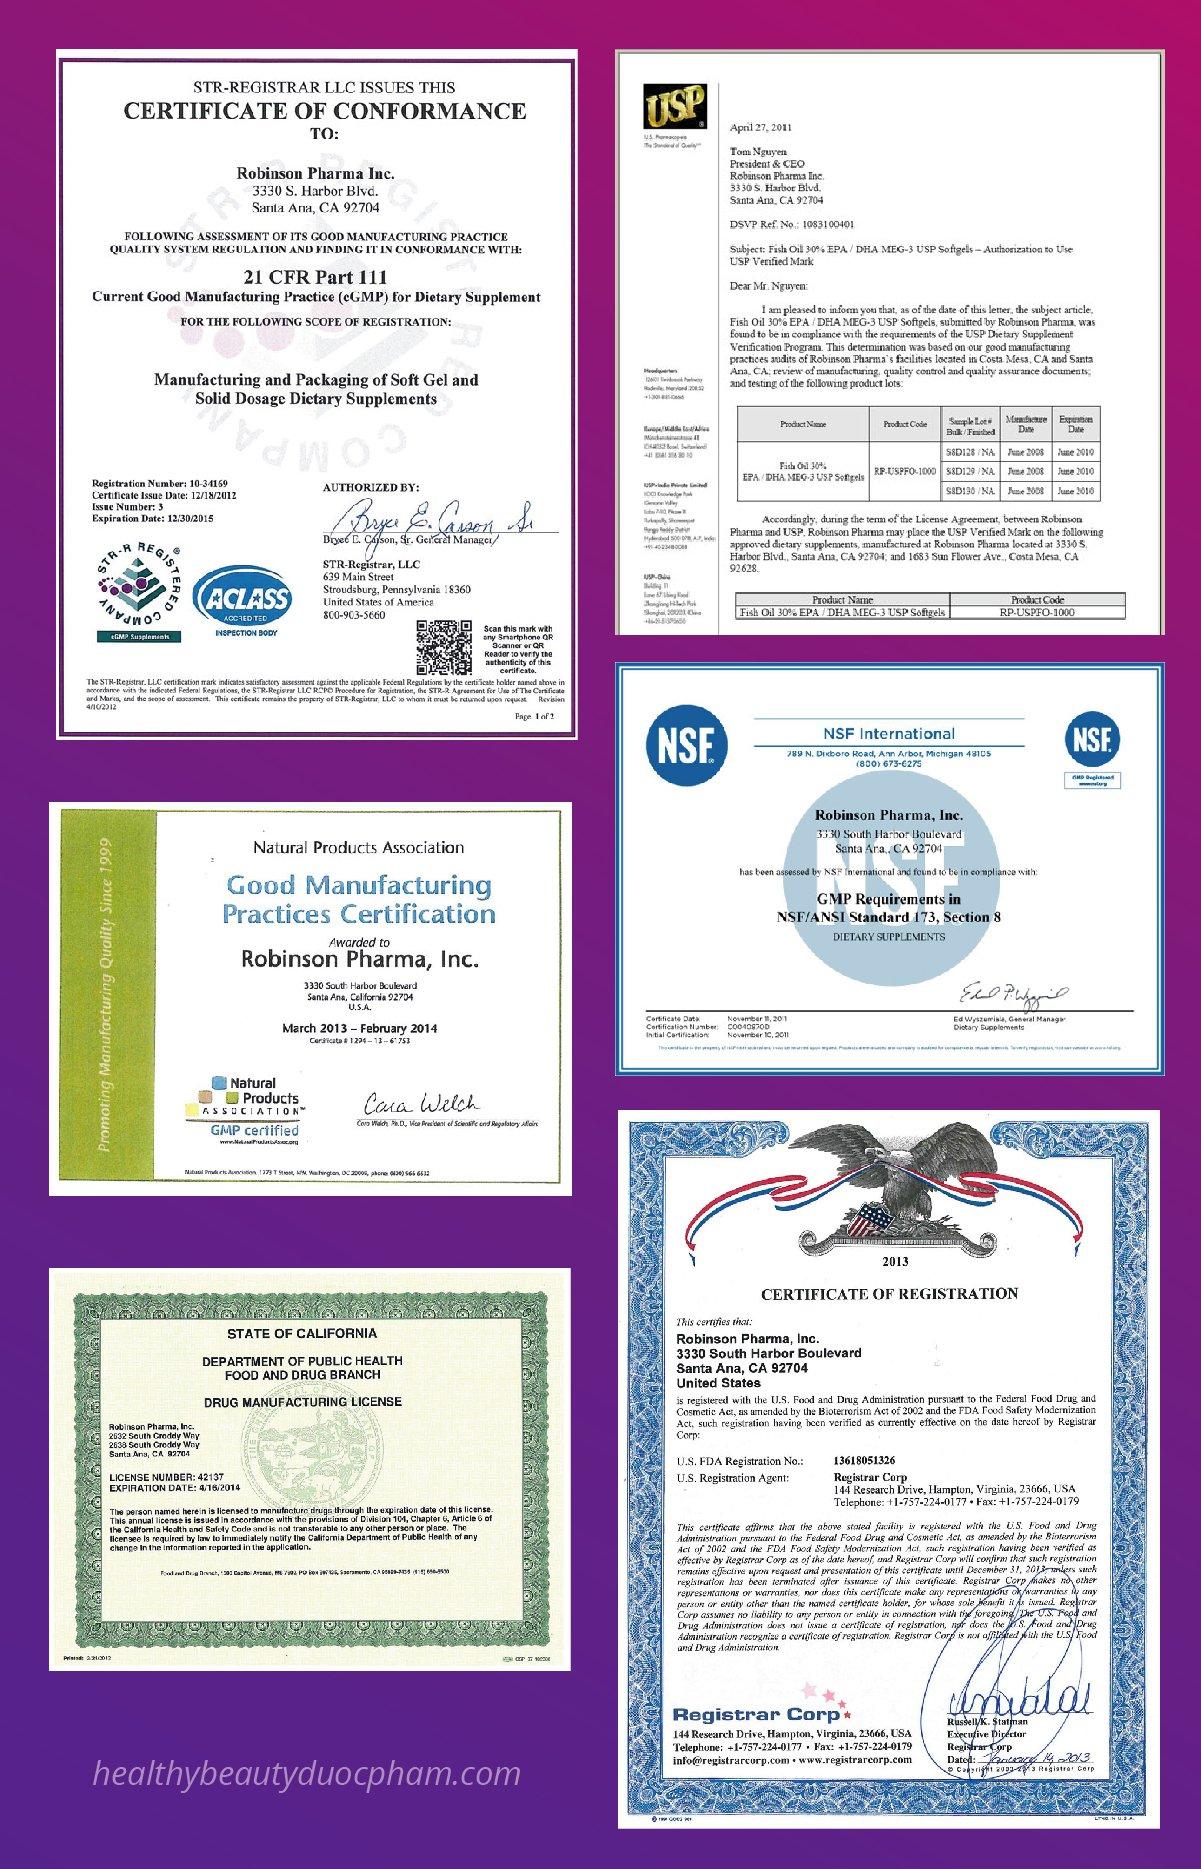 Chứng nhận cGMP của Robinson Pharmama